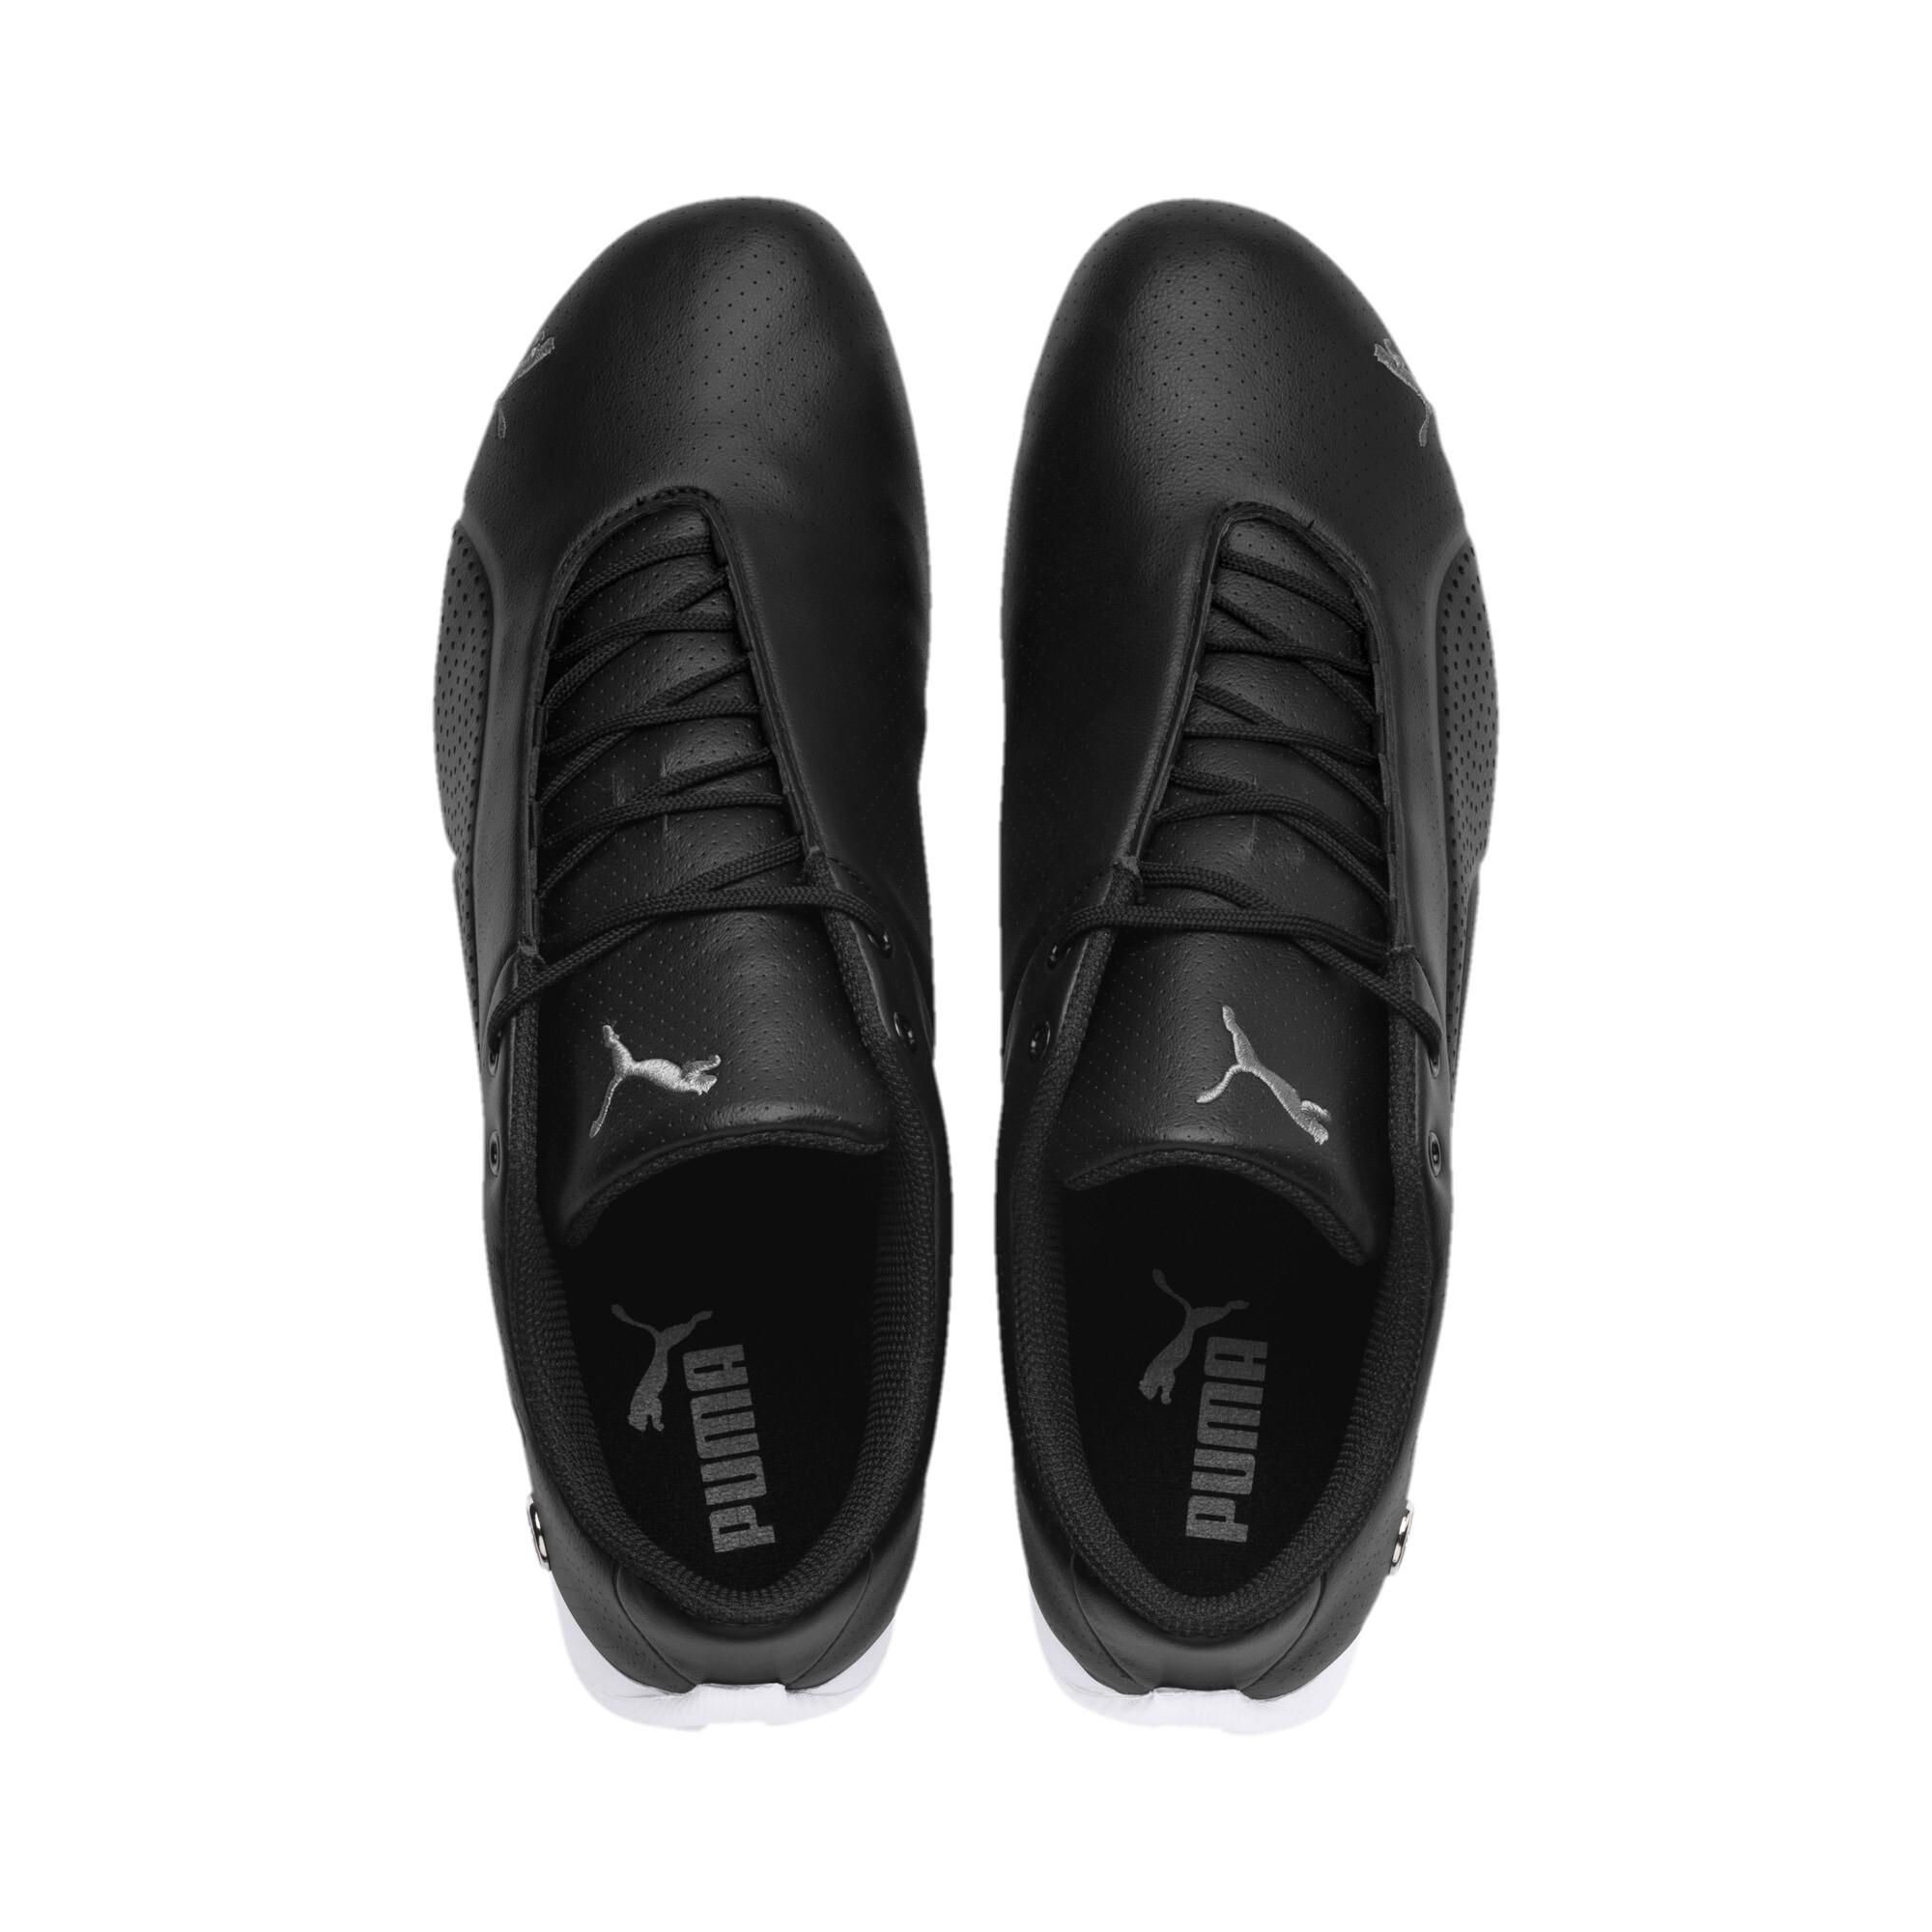 Indexbild 17 - PUMA BMW M Motorsport Future Cat Ultra Sneaker Unisex Schuhe Neu